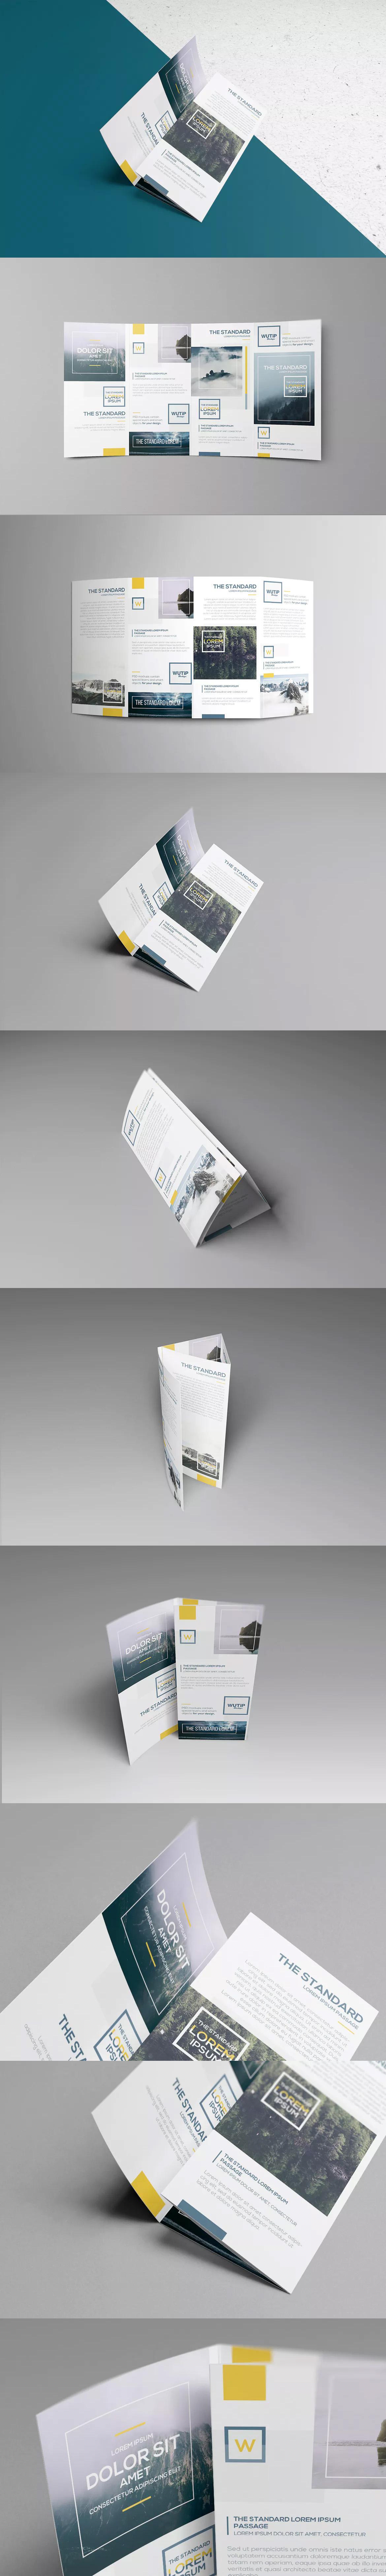 Four Fold Brochure Template Psd